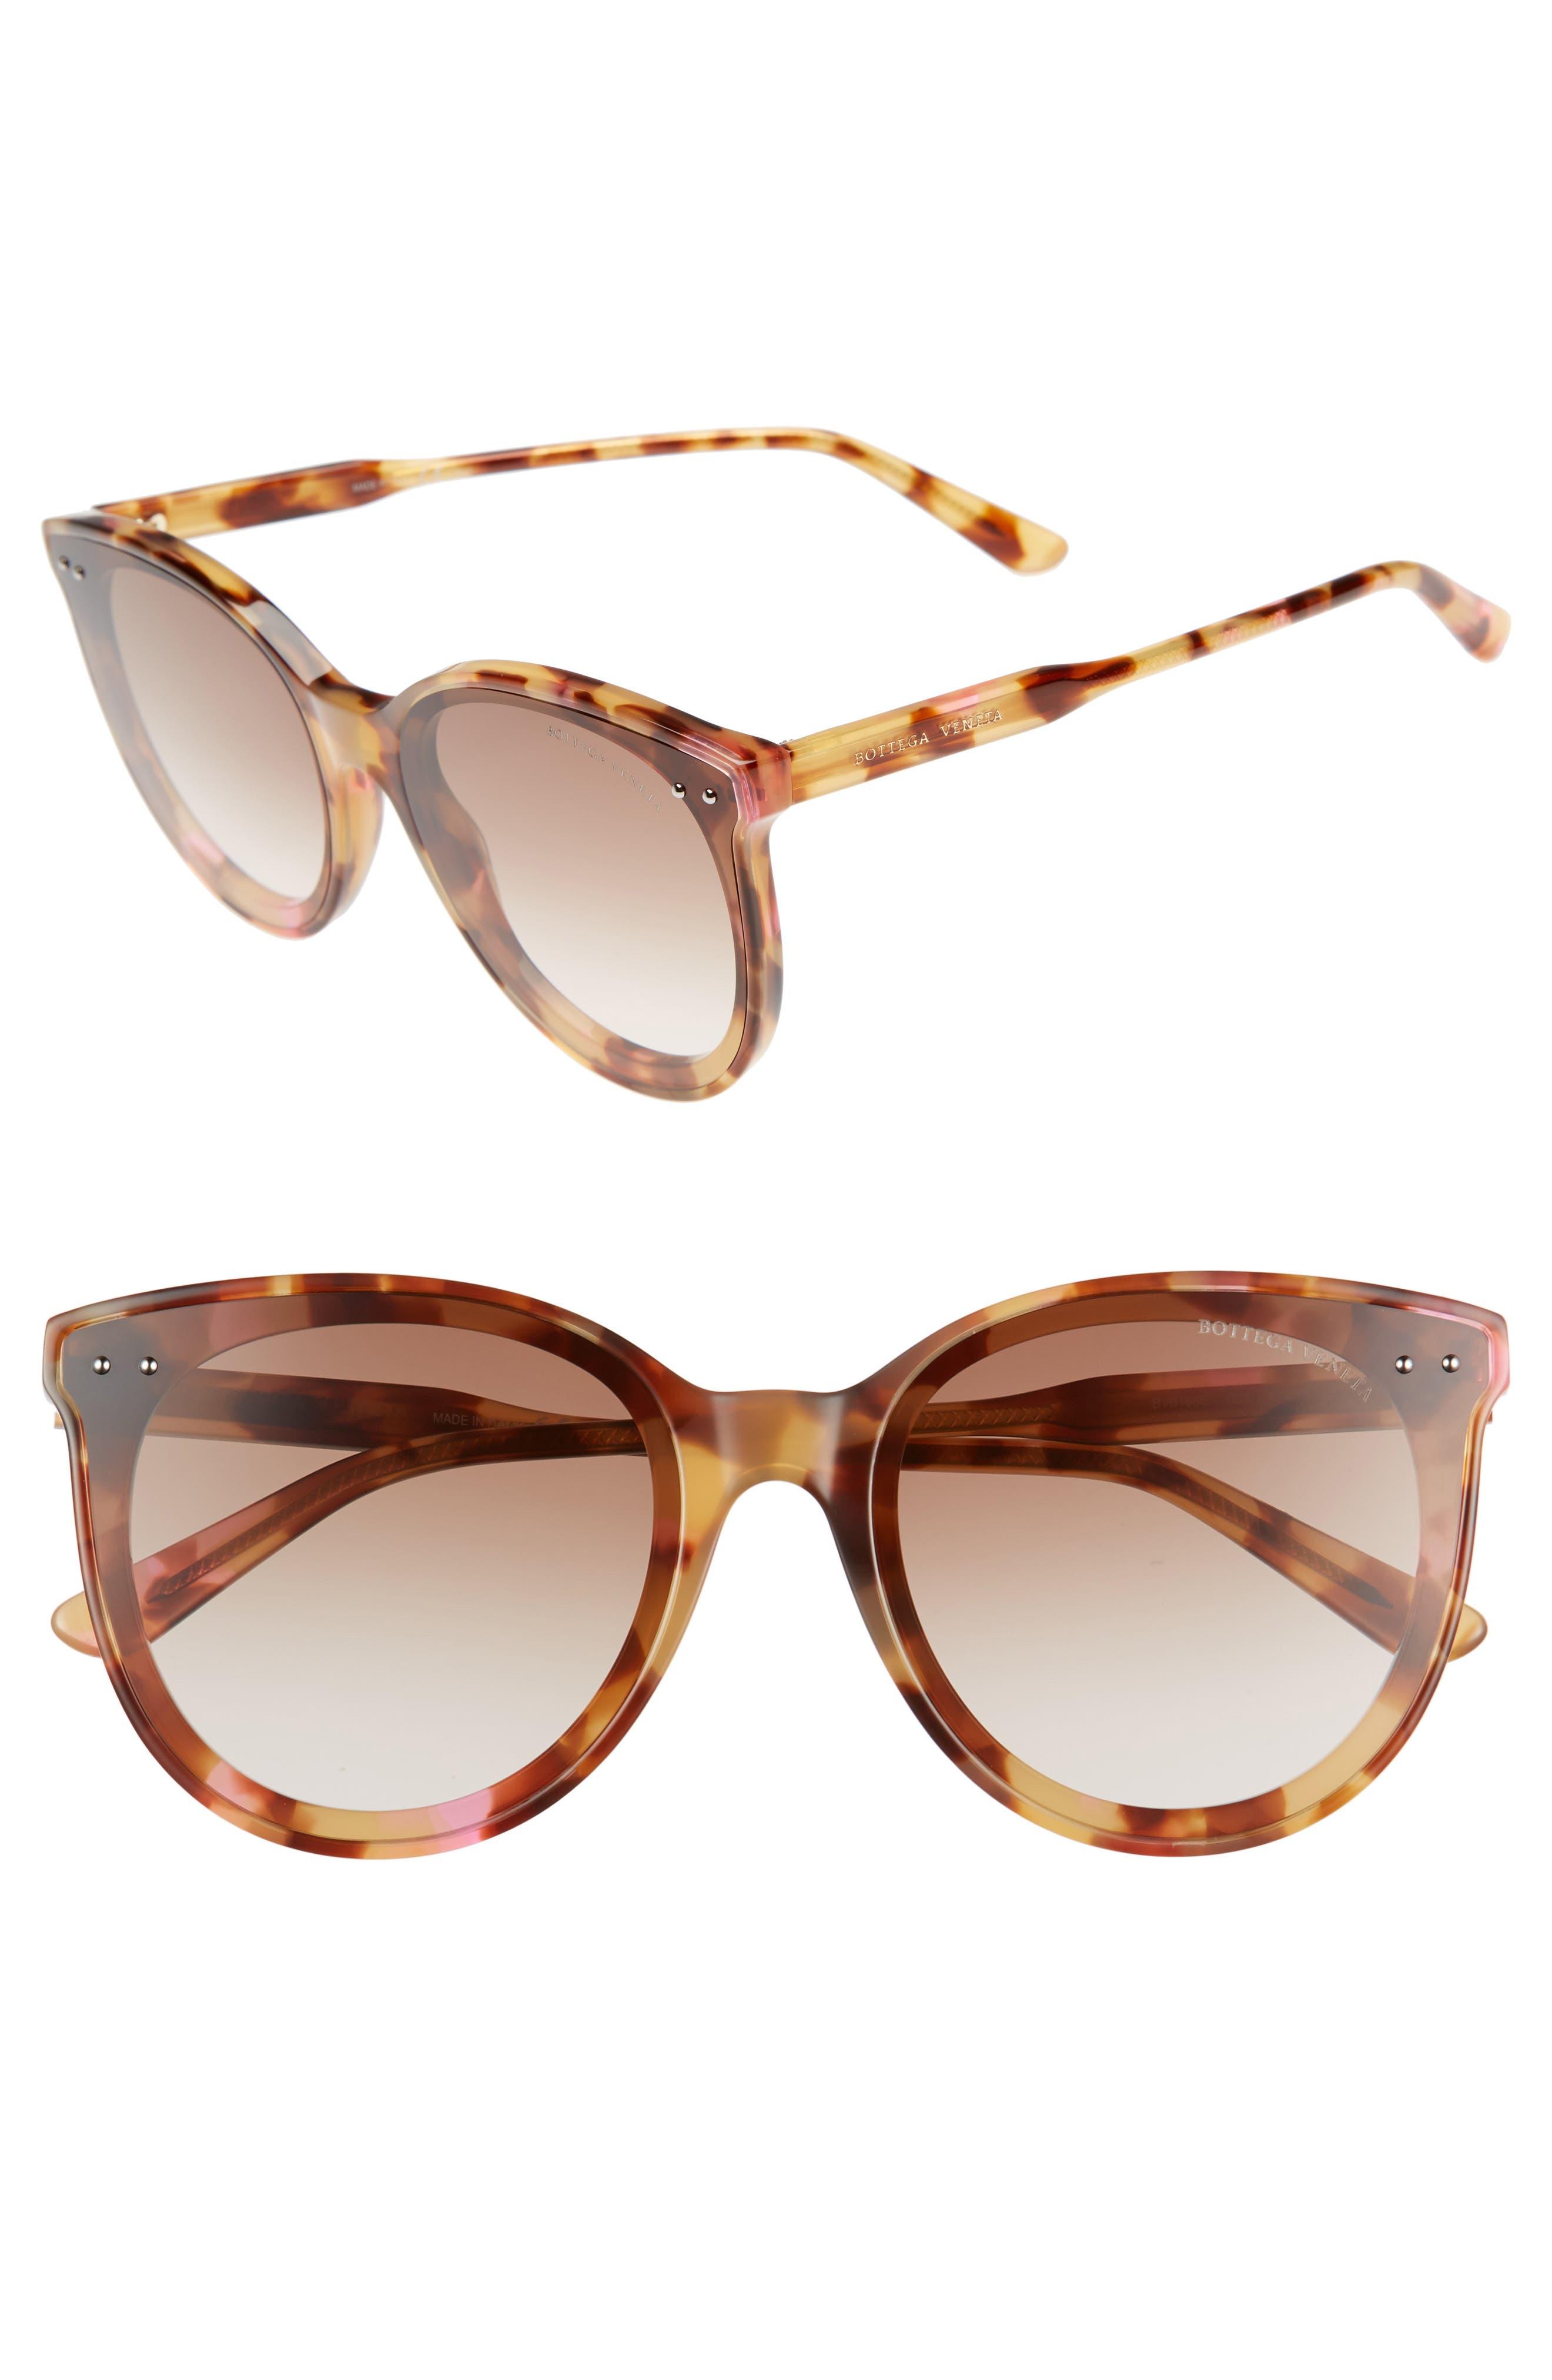 61mm Cat Eye Sunglasses,                             Main thumbnail 1, color,                             PINK HAVANA